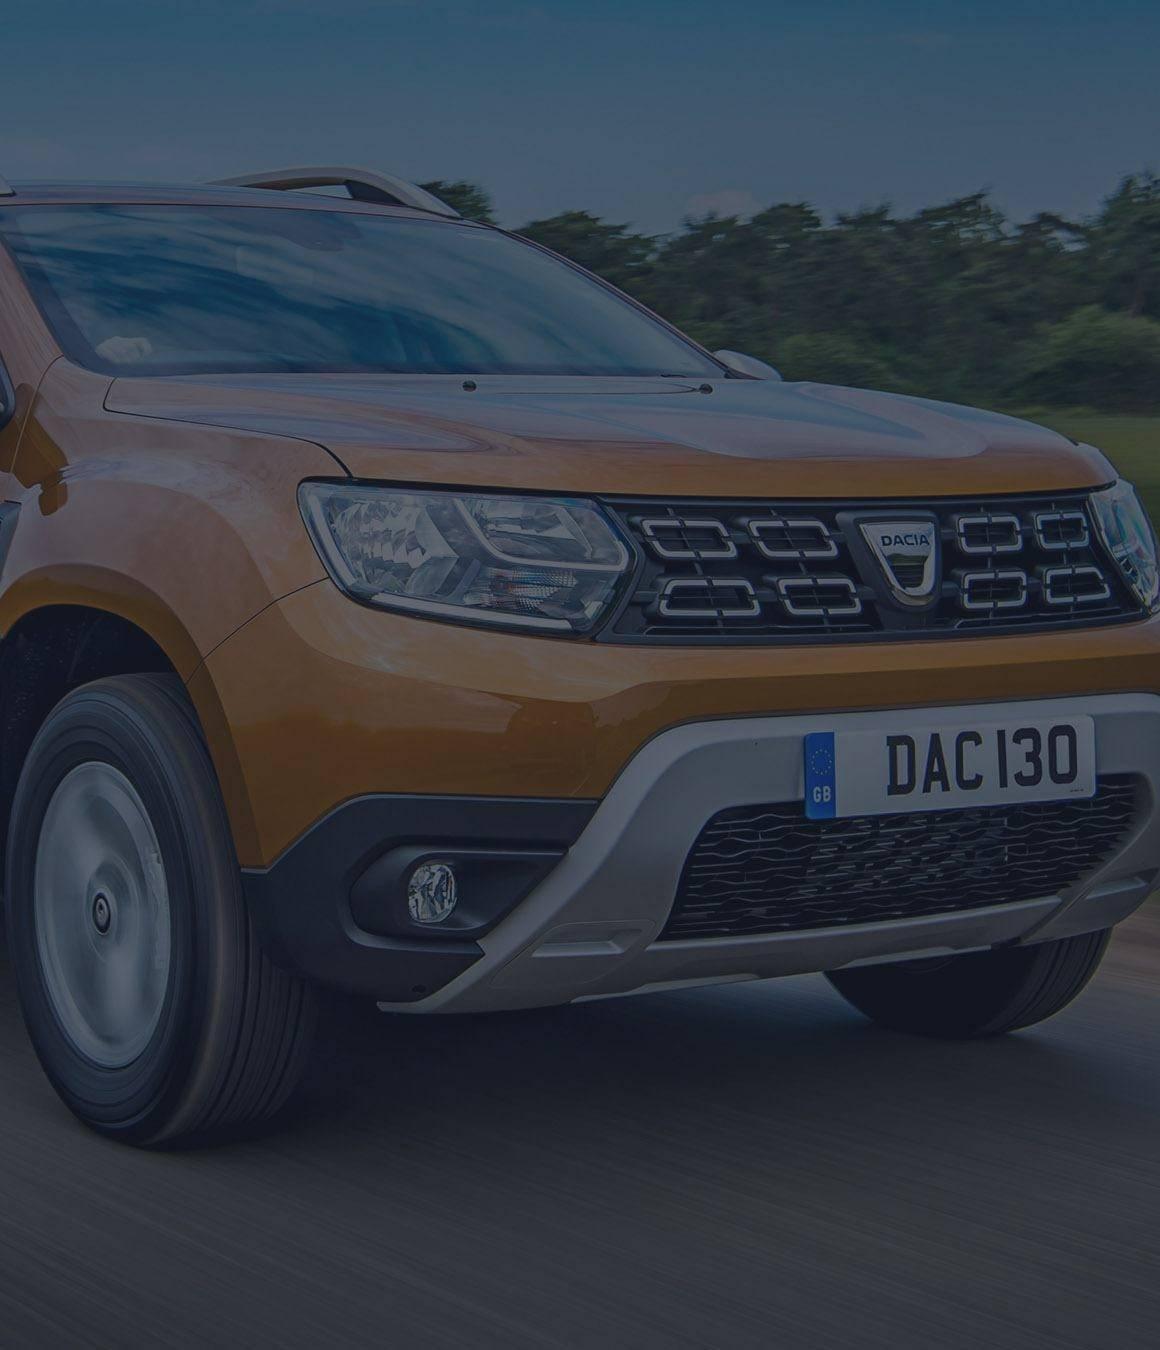 Dacia car insurance quote online